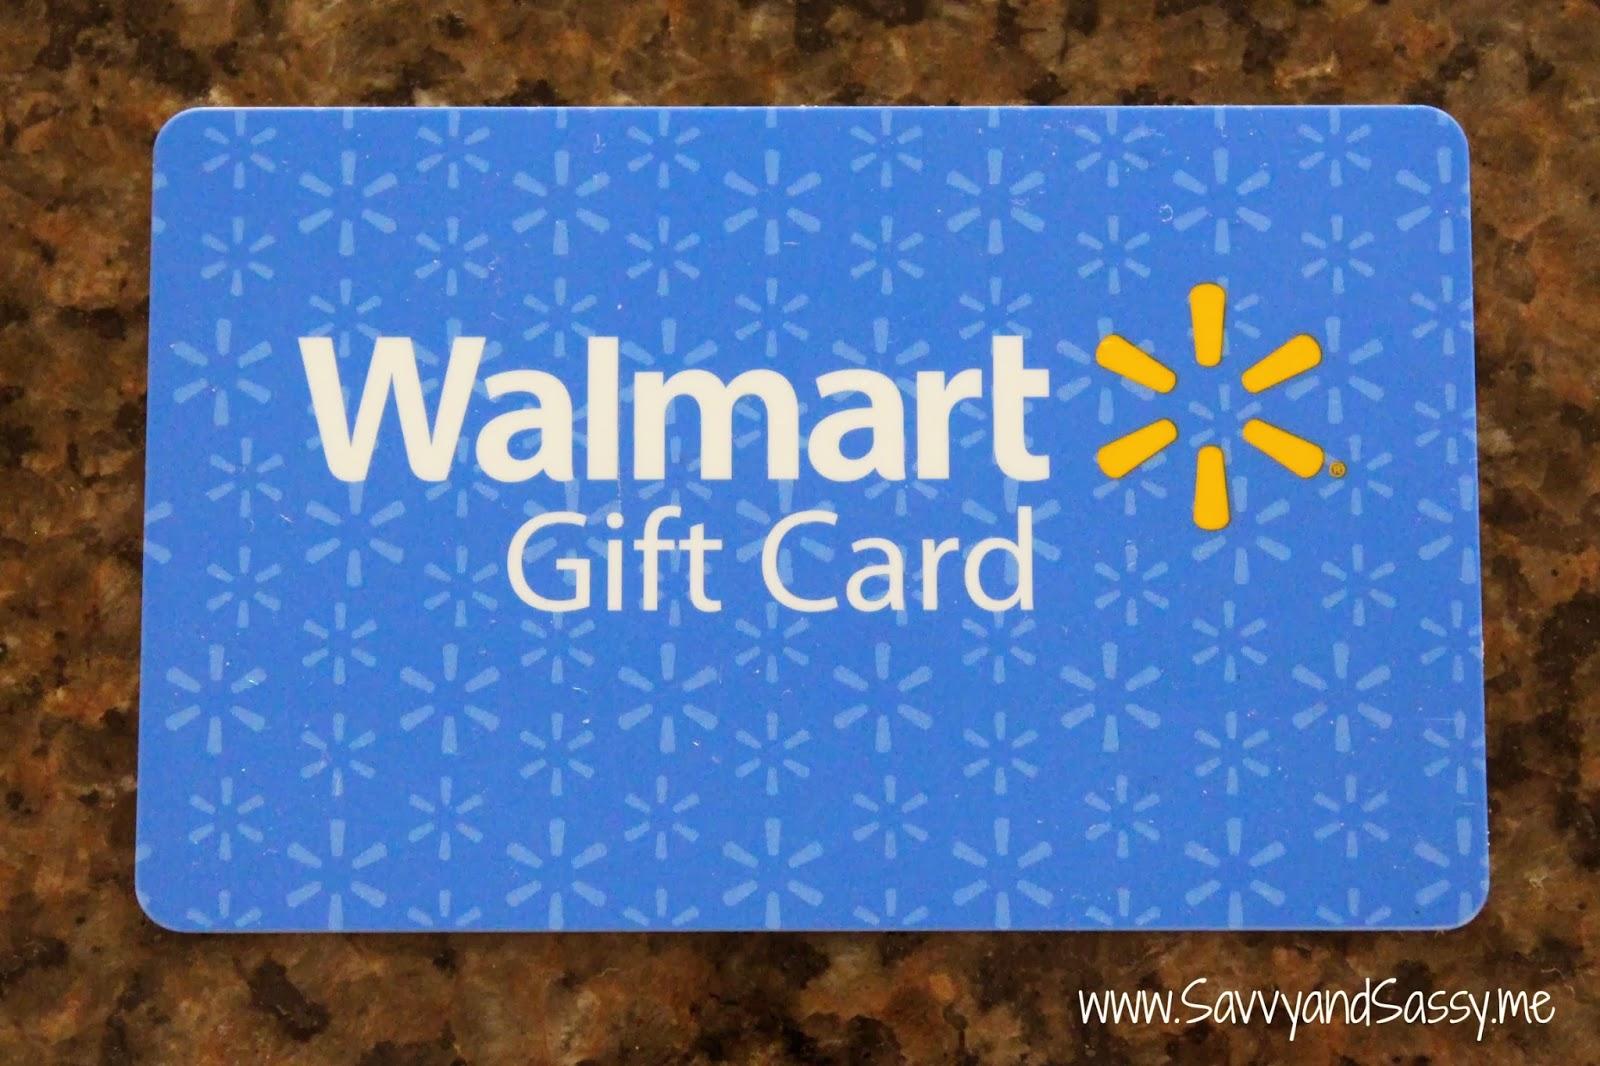 Savvy and sassy winner announcement 25 walmart gift card winner announcement 25 walmart gift card 1betcityfo Choice Image